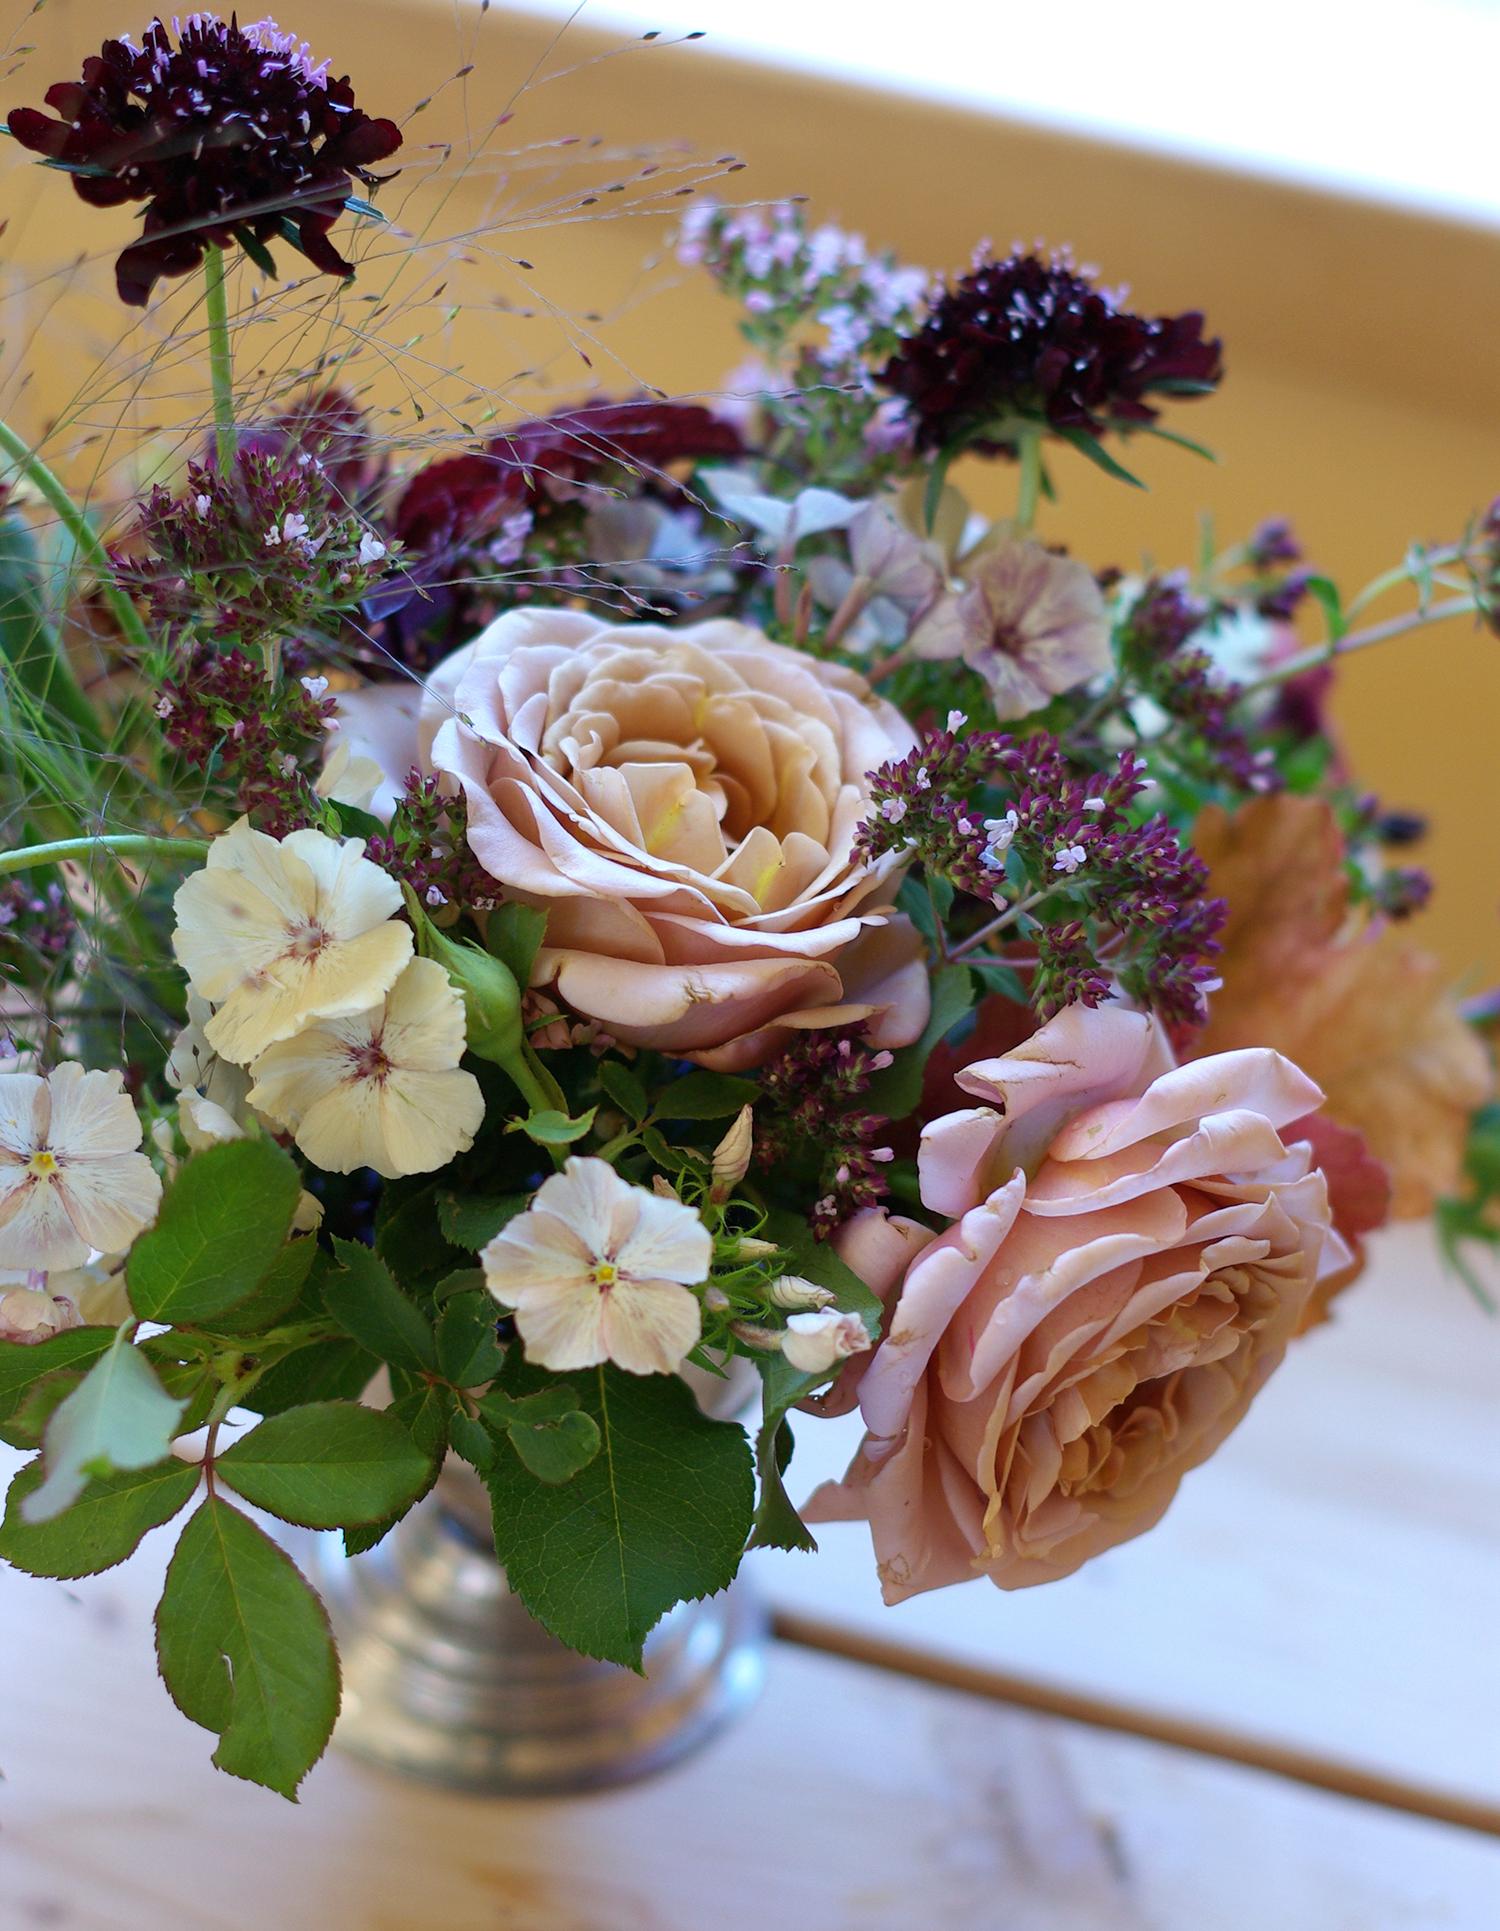 Late July - roses, phlox, oregano, frosted explosion grass, scabiosa, heuchera, coleus